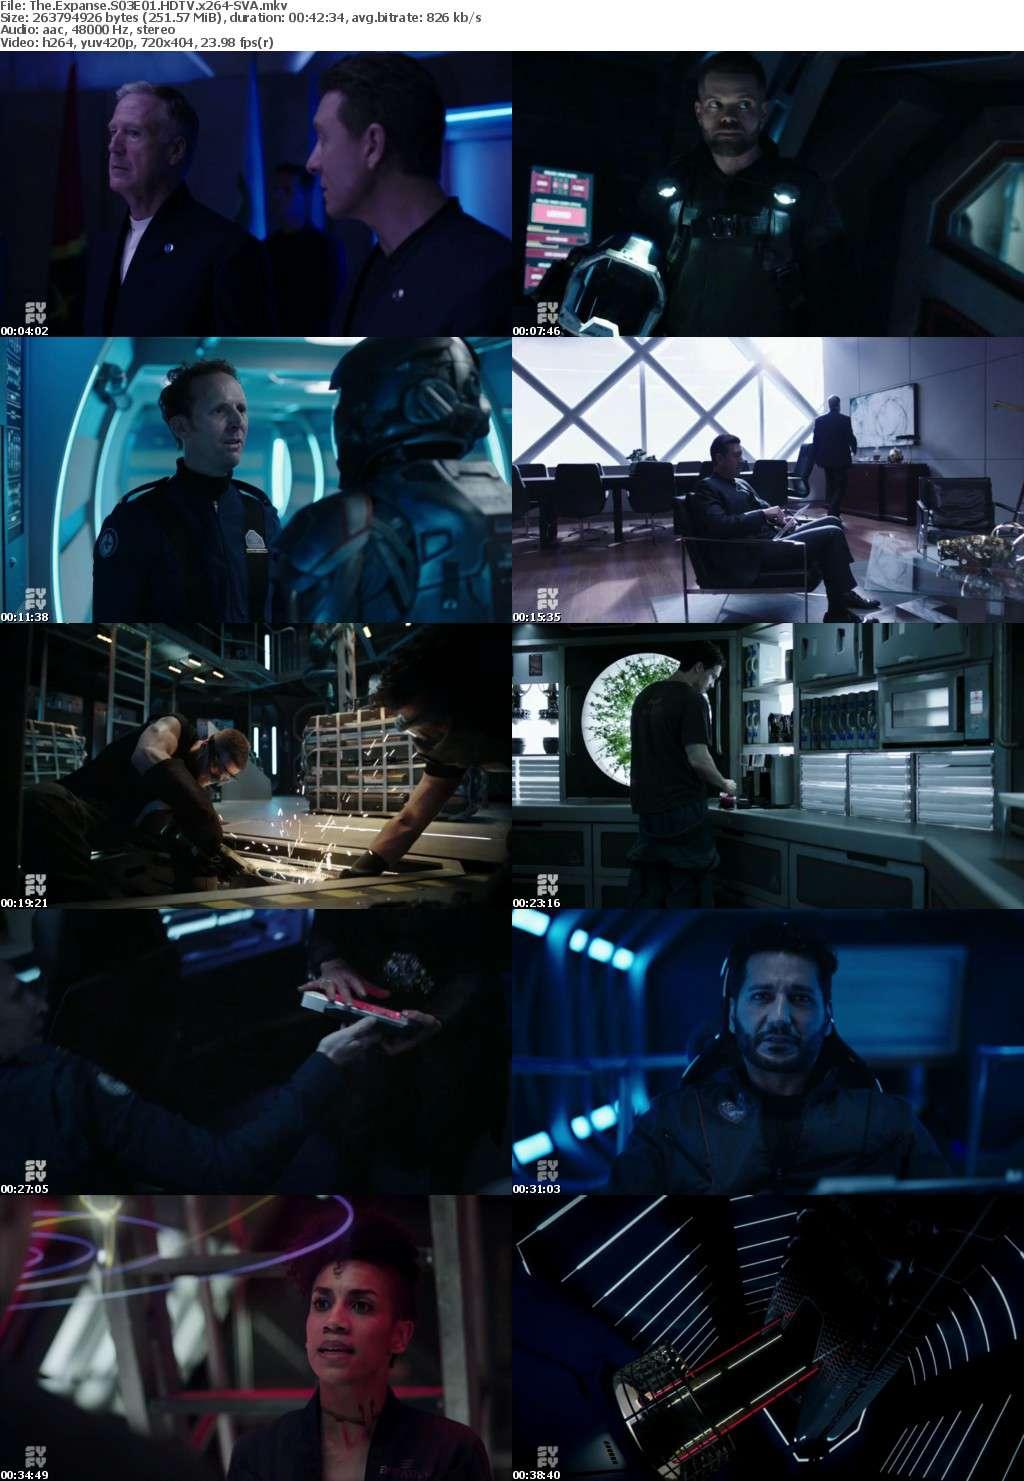 The Expanse S03E01 HDTV x264-SVA